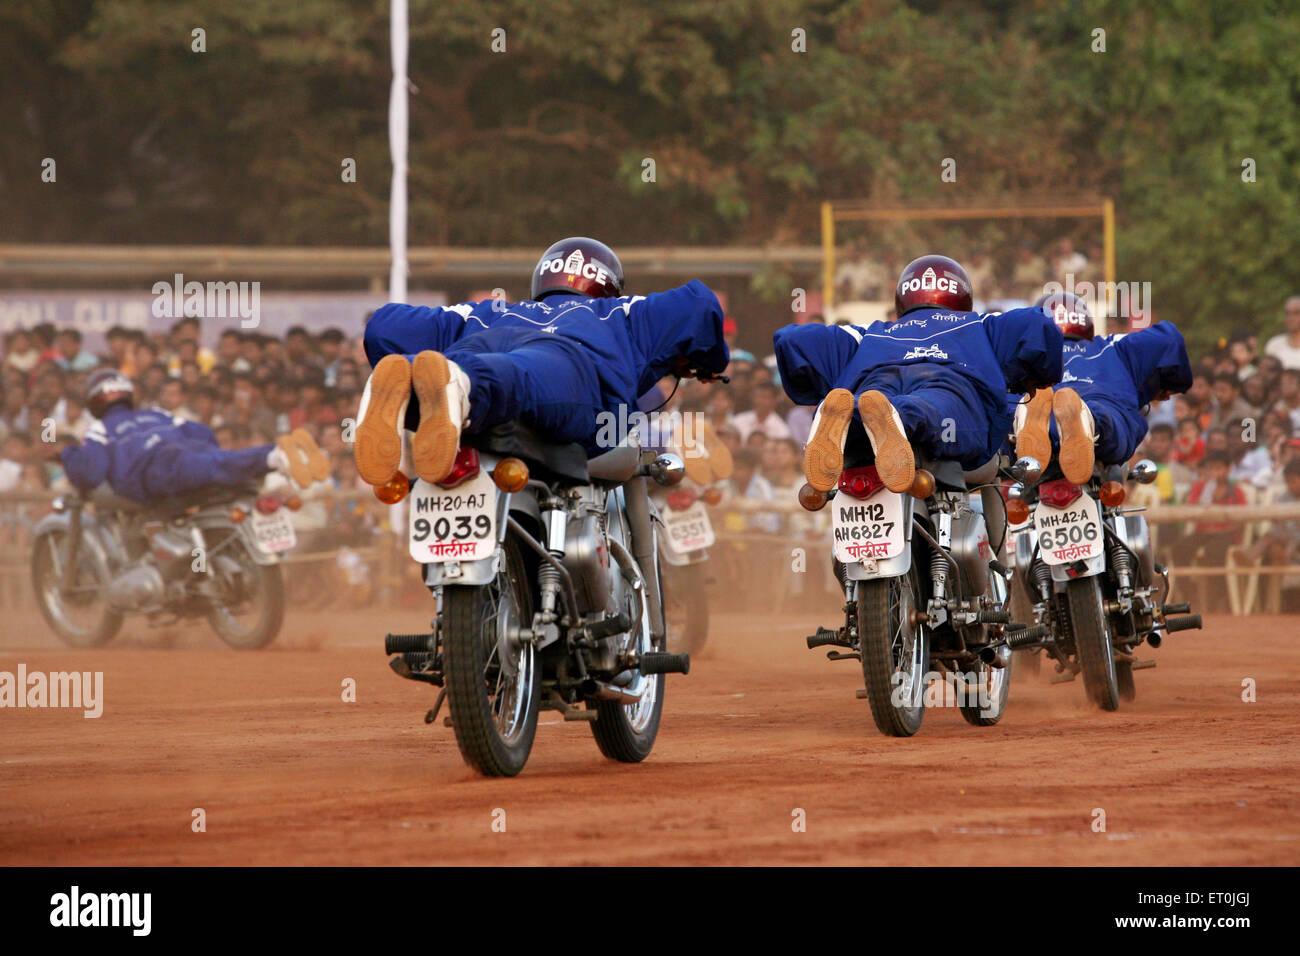 Police men performing stunts on motorbikes on 1 May Maharashtra state foundation day ; Shivaji park ; Dadar ; Mumbai - Stock Image